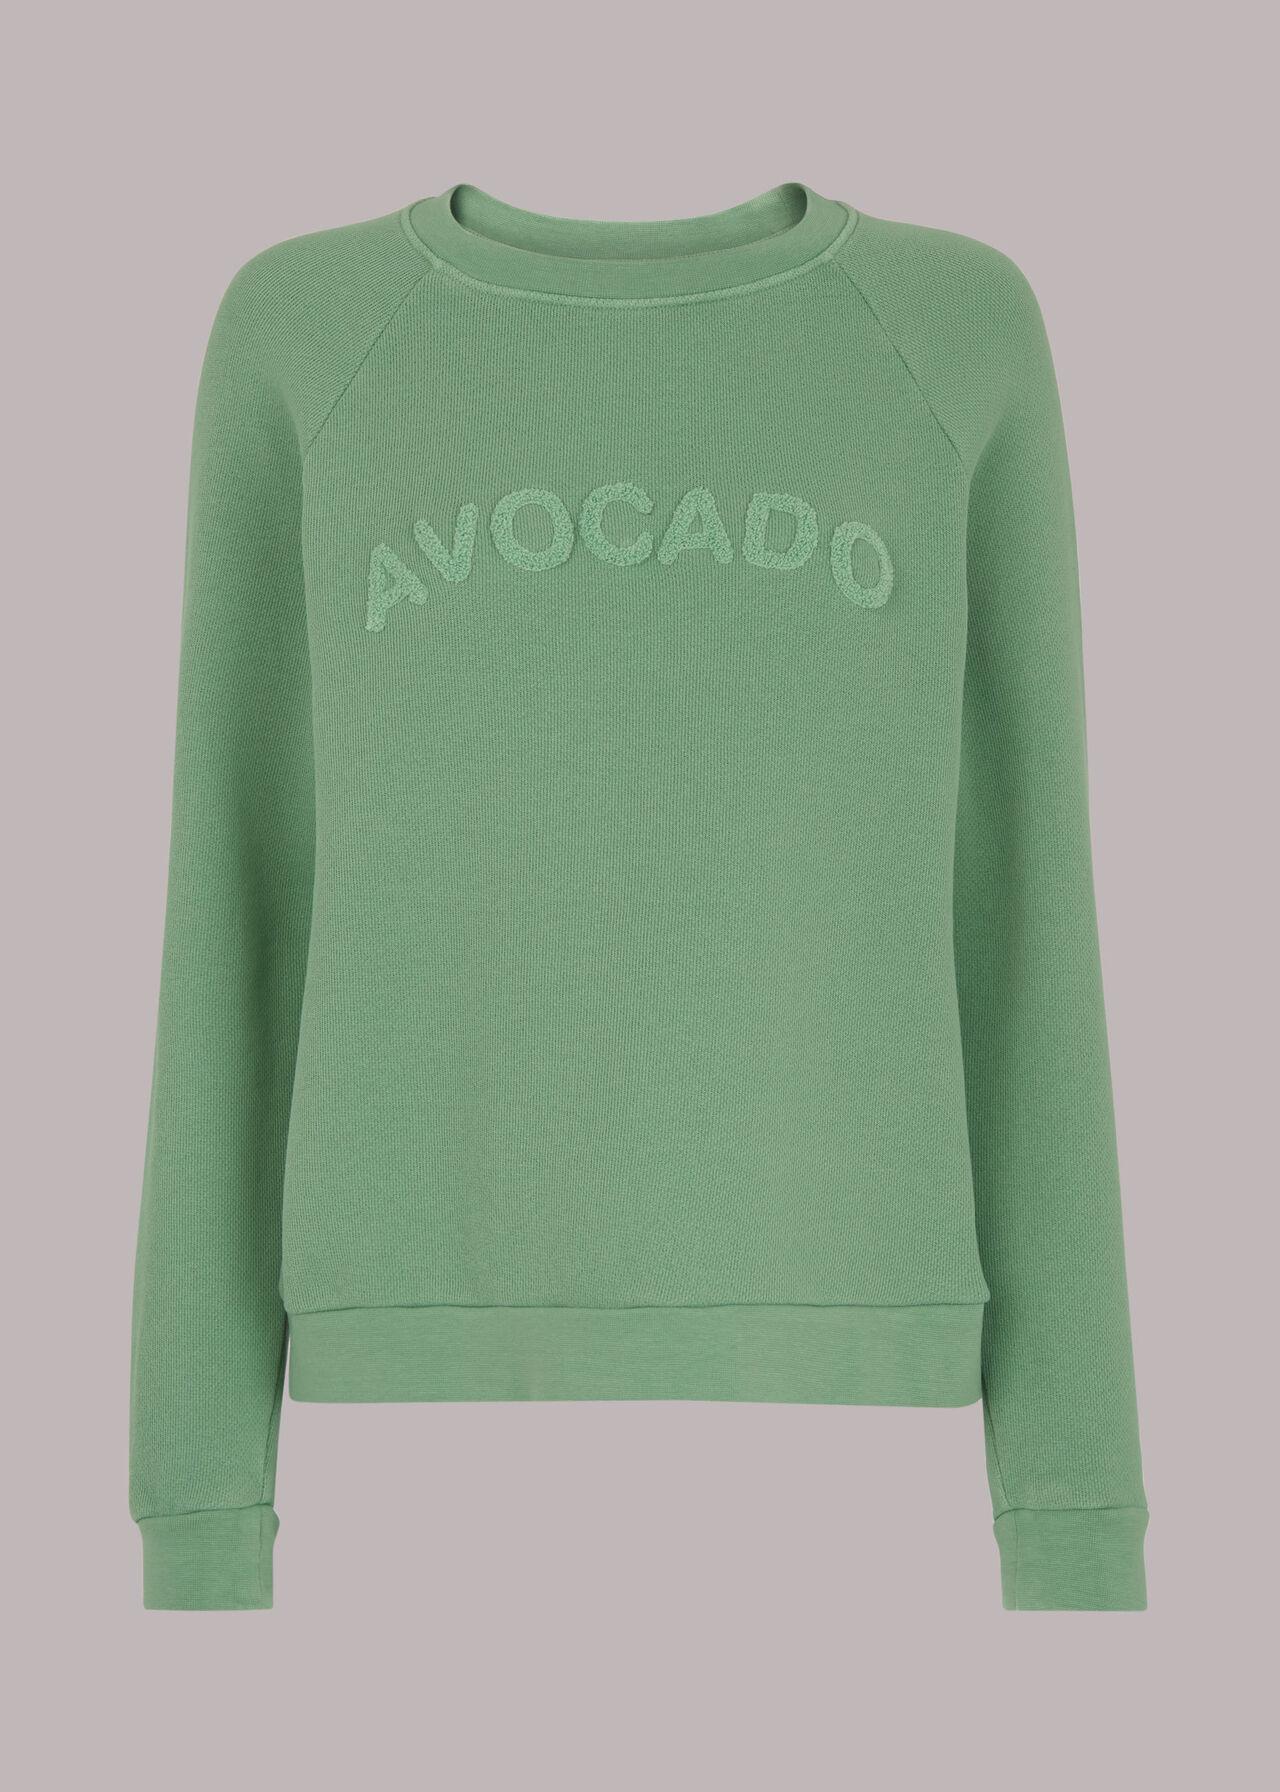 Avocado Logo Sweatshirt